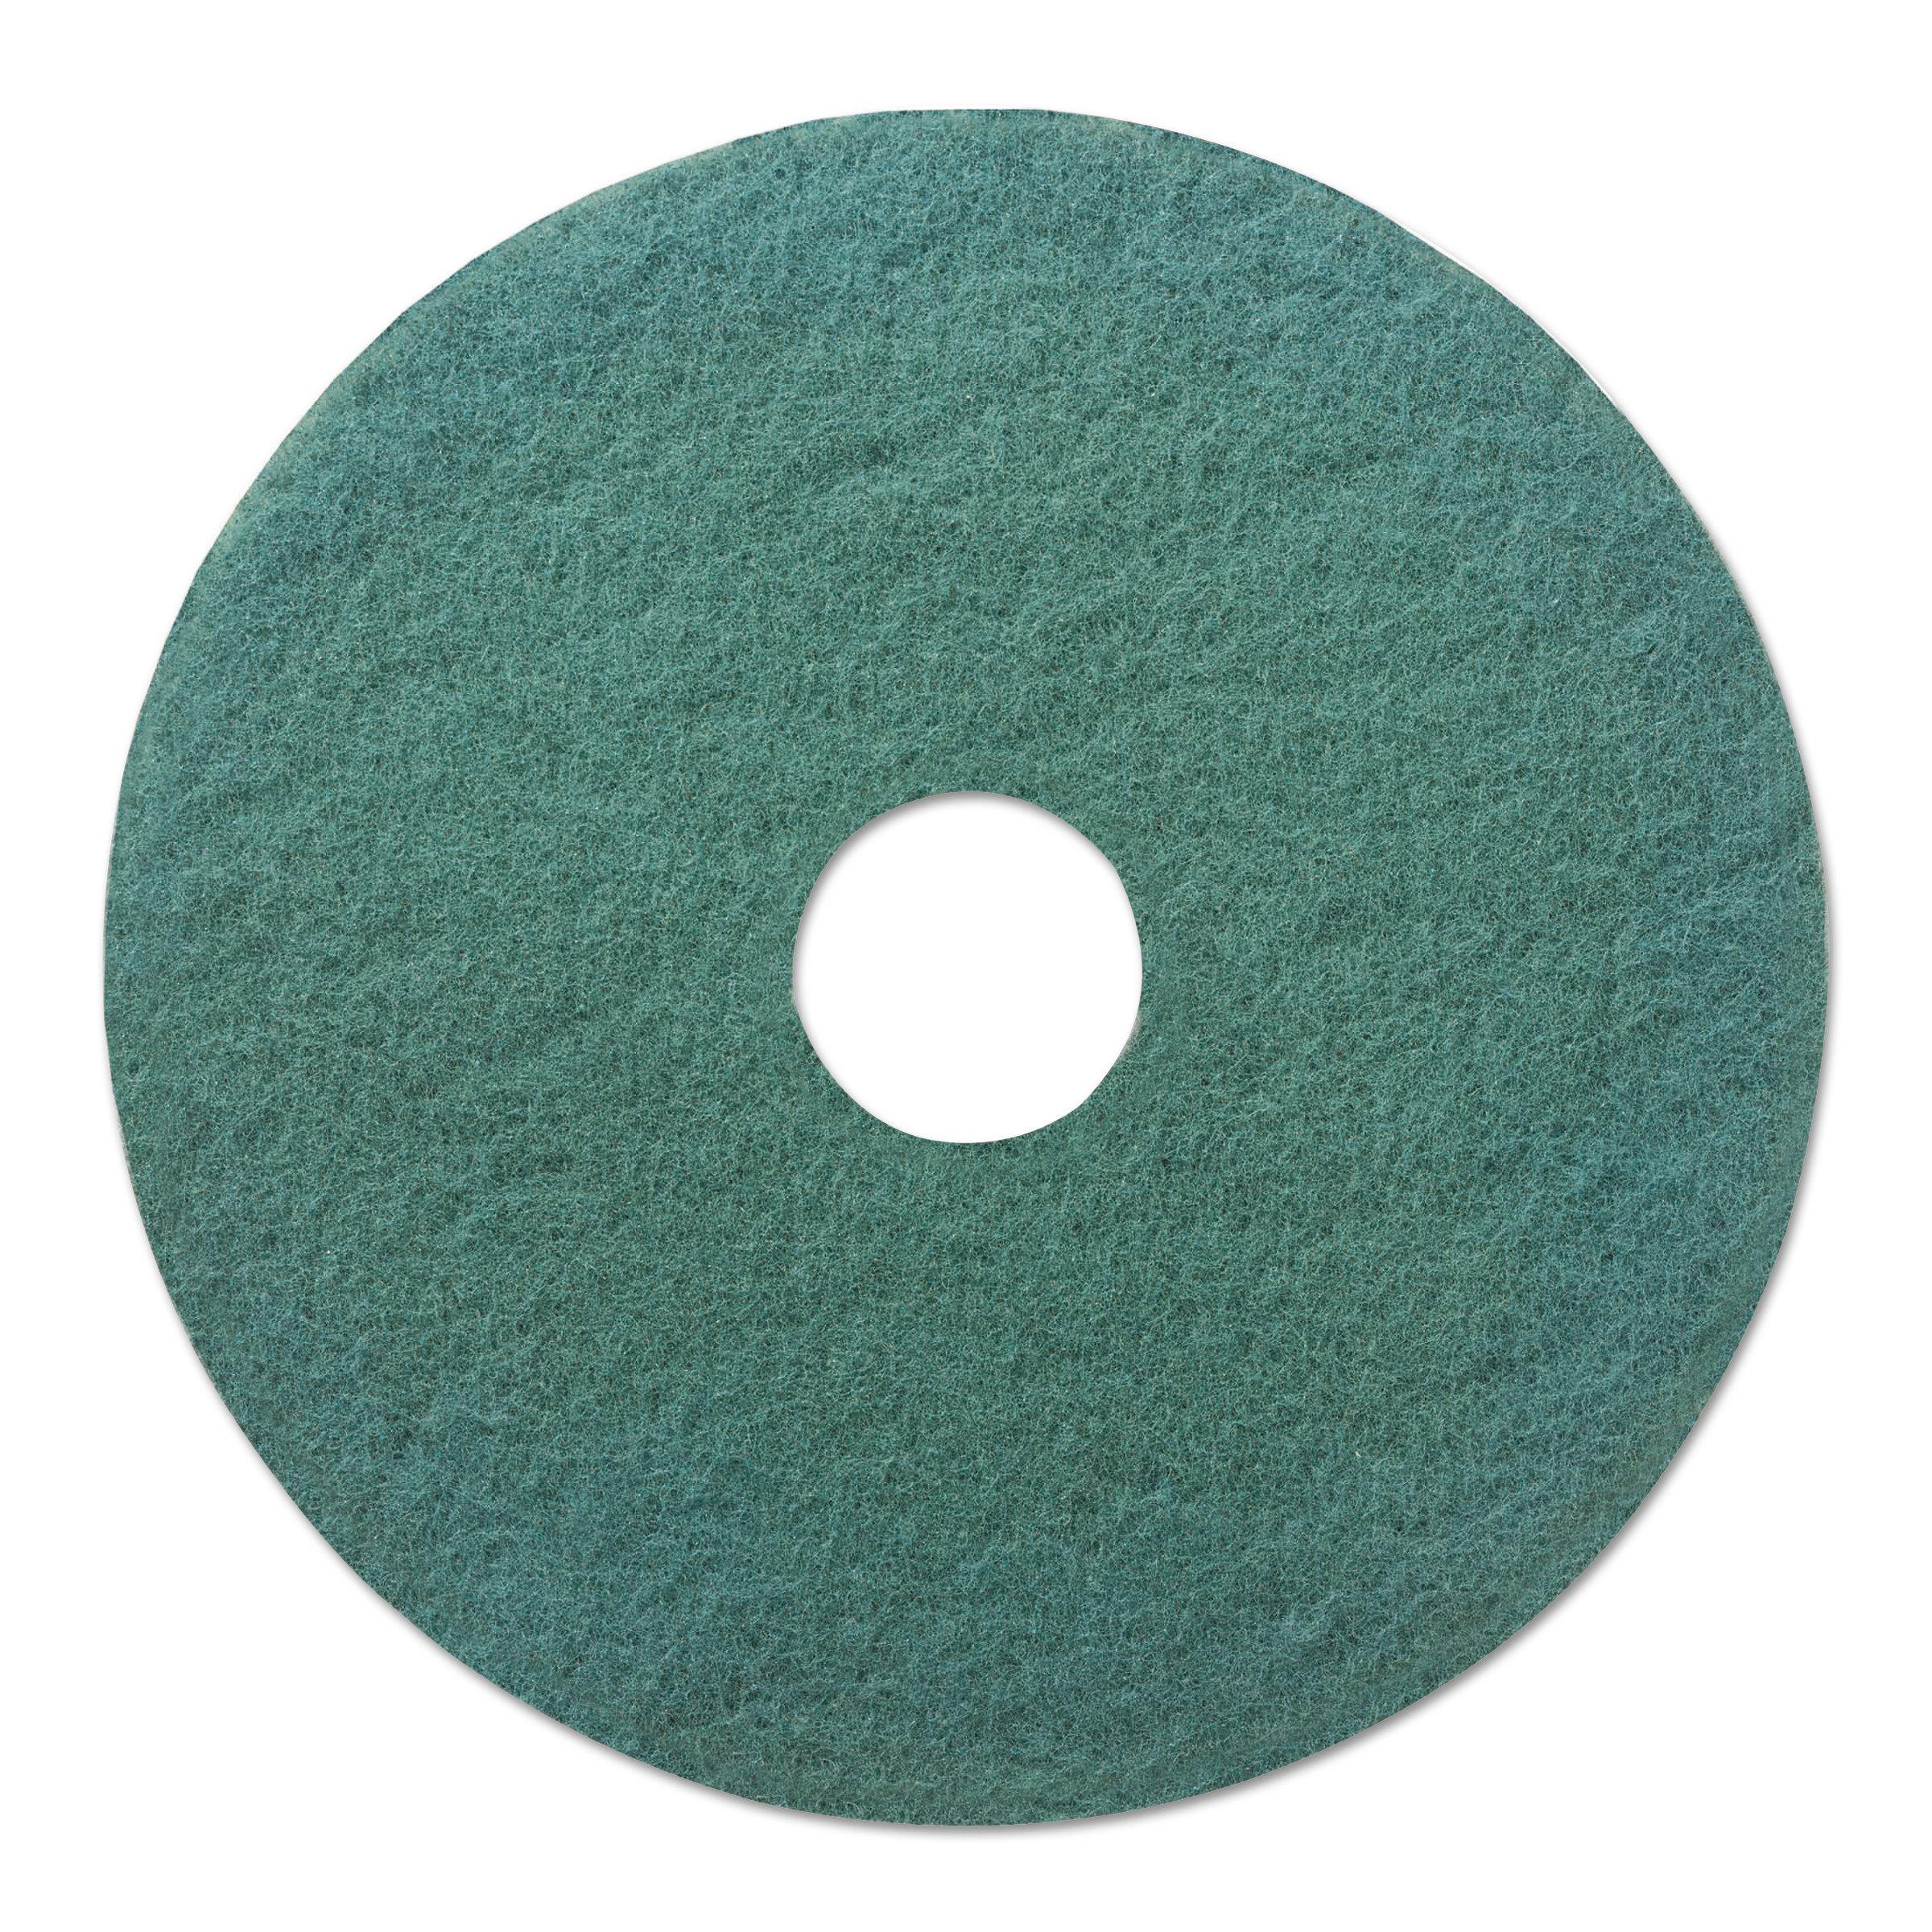 Boardwalk 4020GRE Standard Floor Pads, 20'' Diameter, Green (Case of 5)